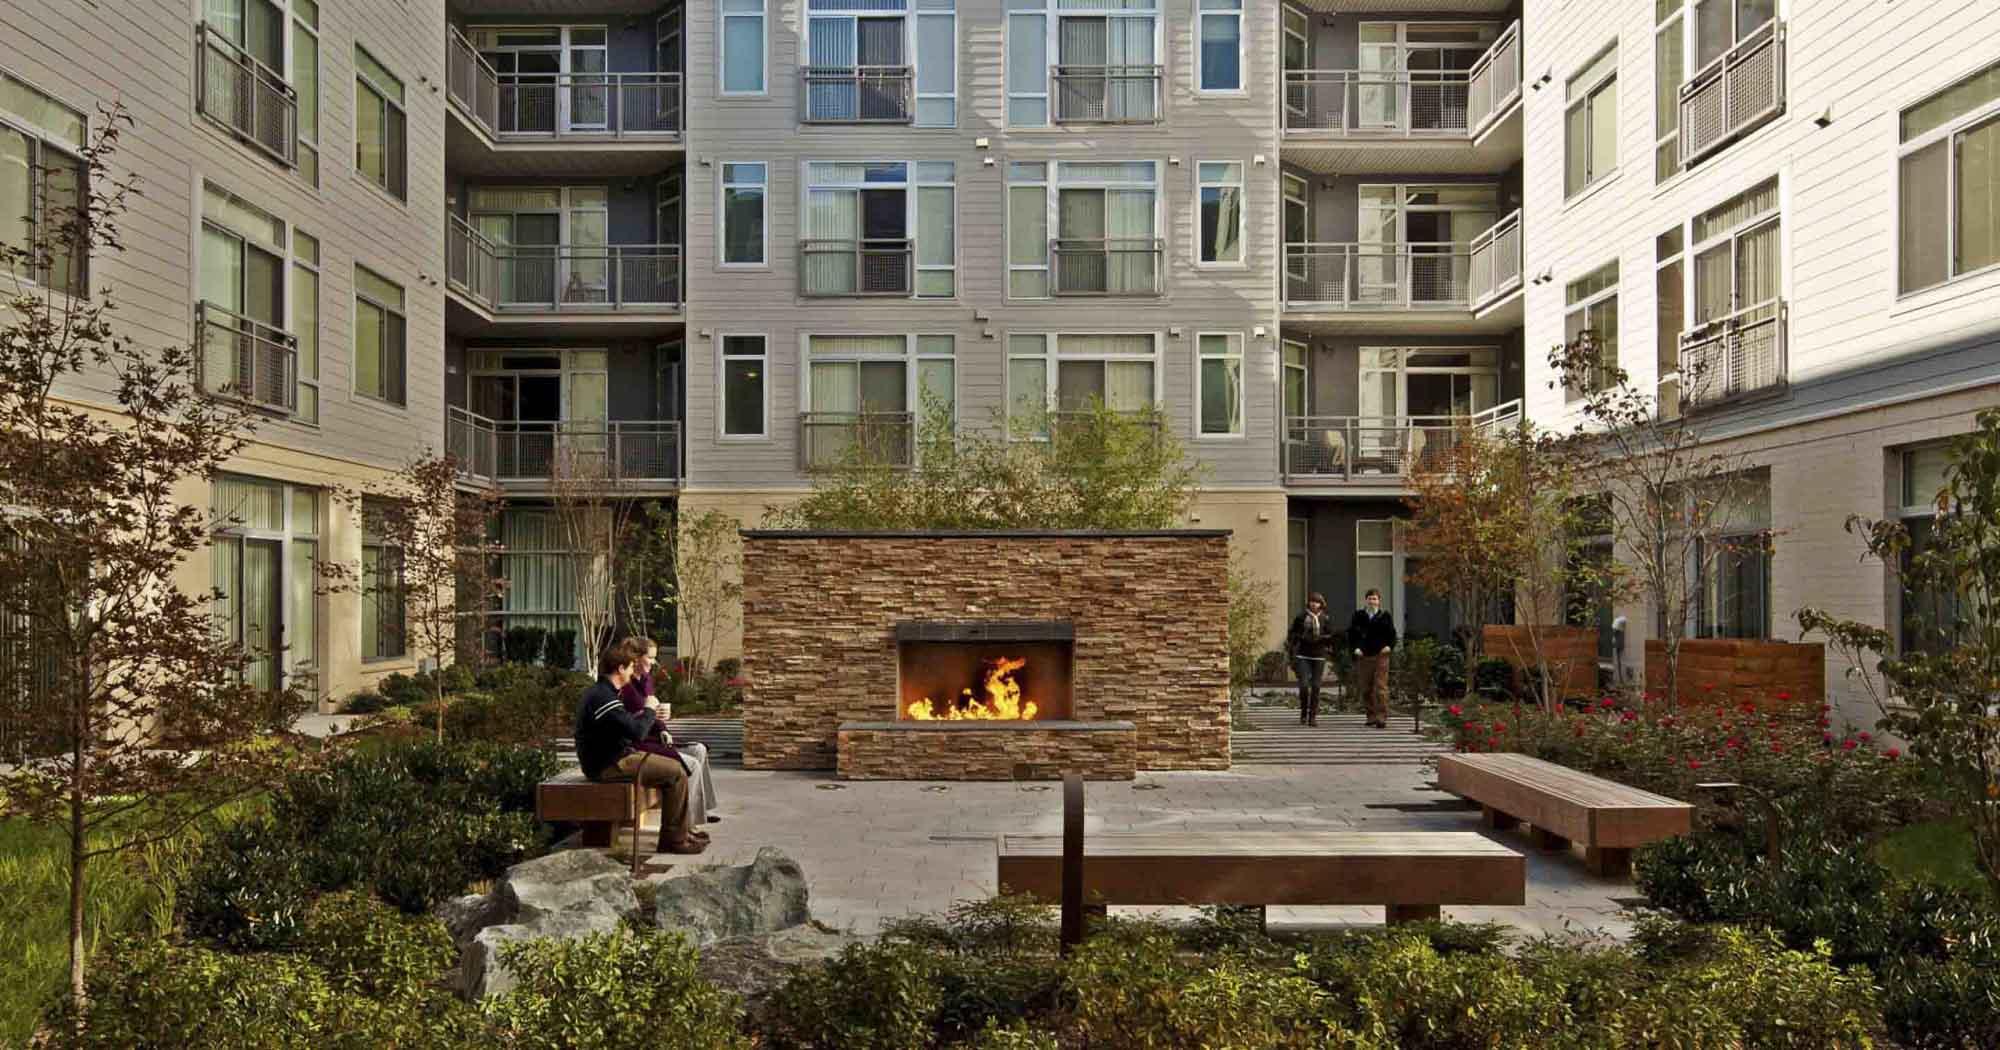 Residential, Outdoor Amenities, Data, Luxury, Urban living, Fireplace, zen garden